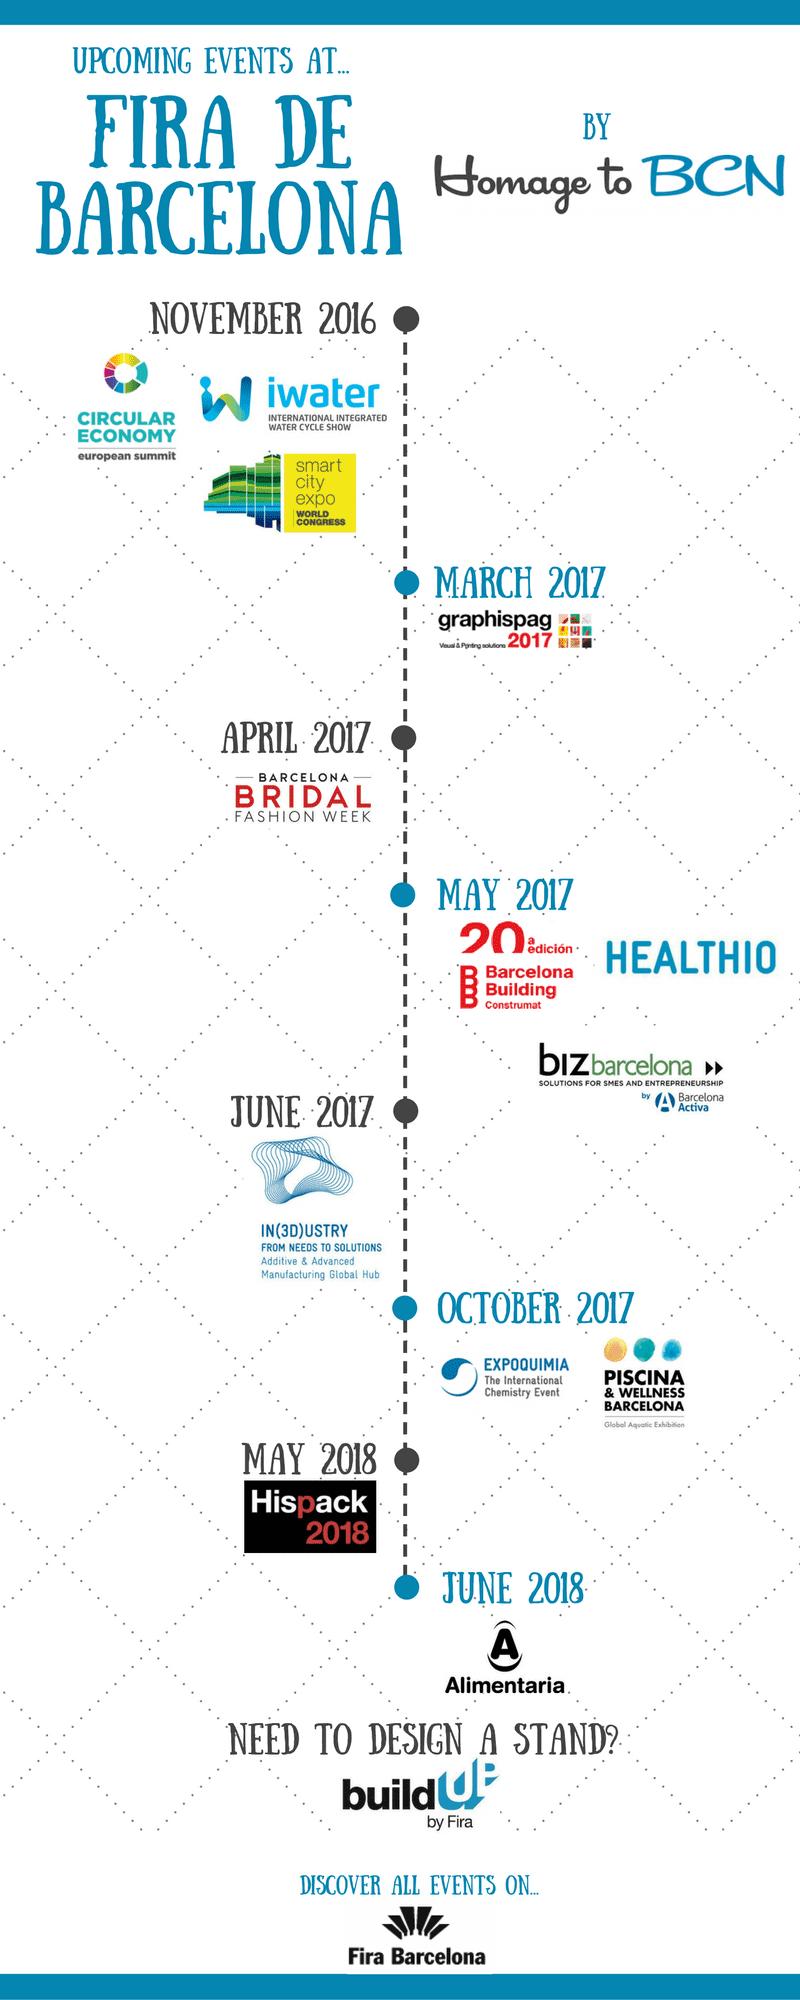 Fira de Barcelona events infographic